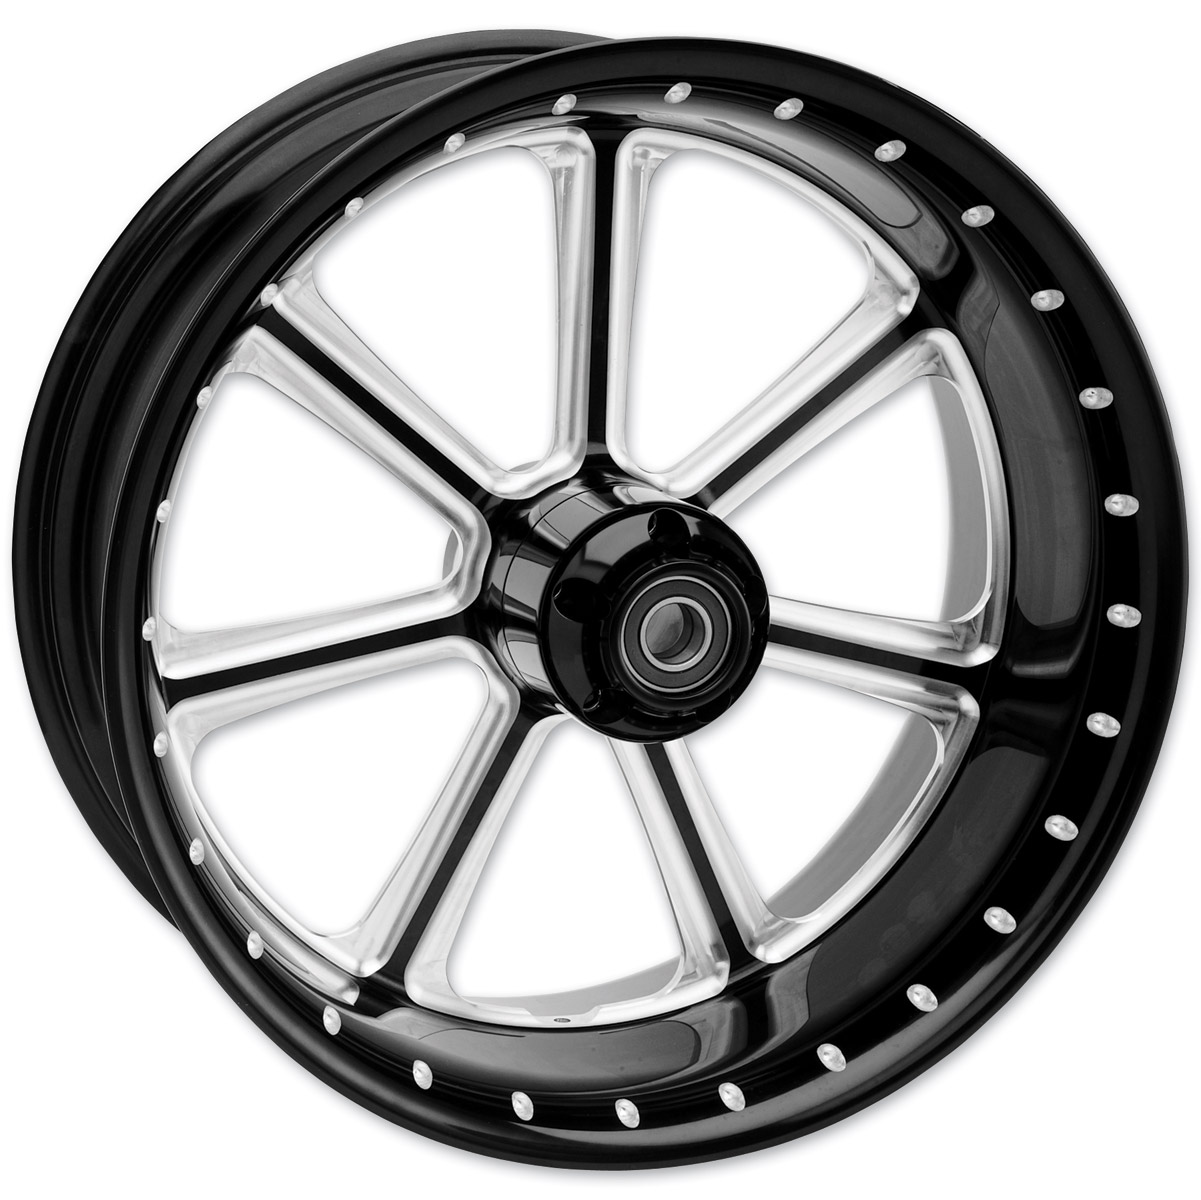 Roland Sands Design Contrast Cut Diesel Front Wheel, 21 x 2.15